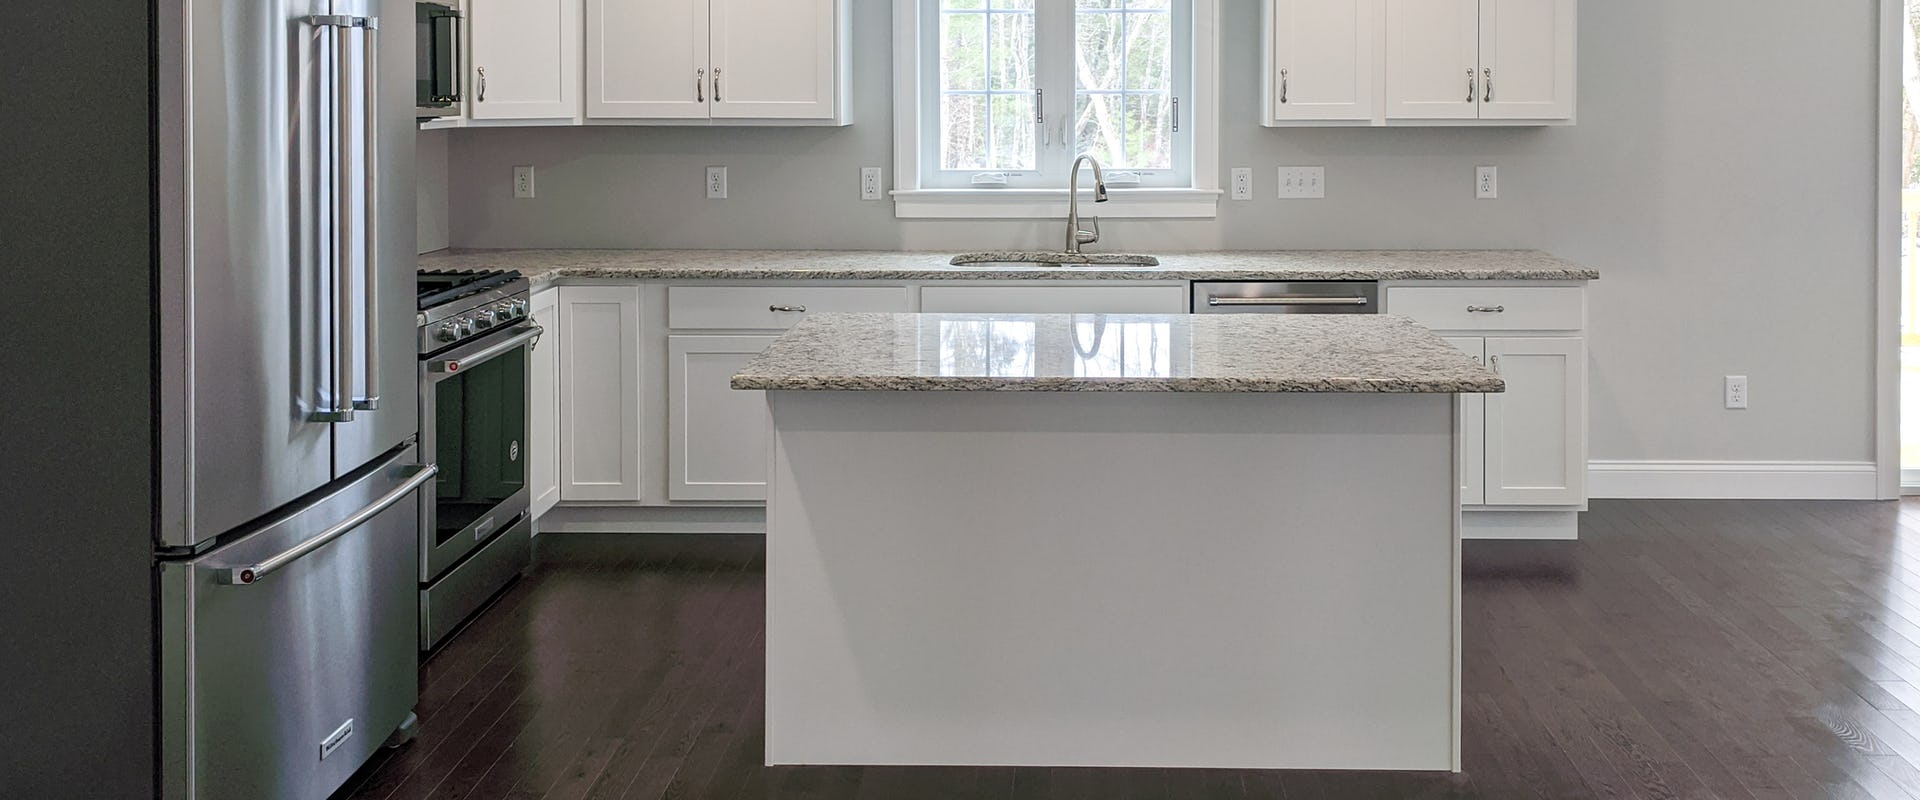 white kitchen island in new home